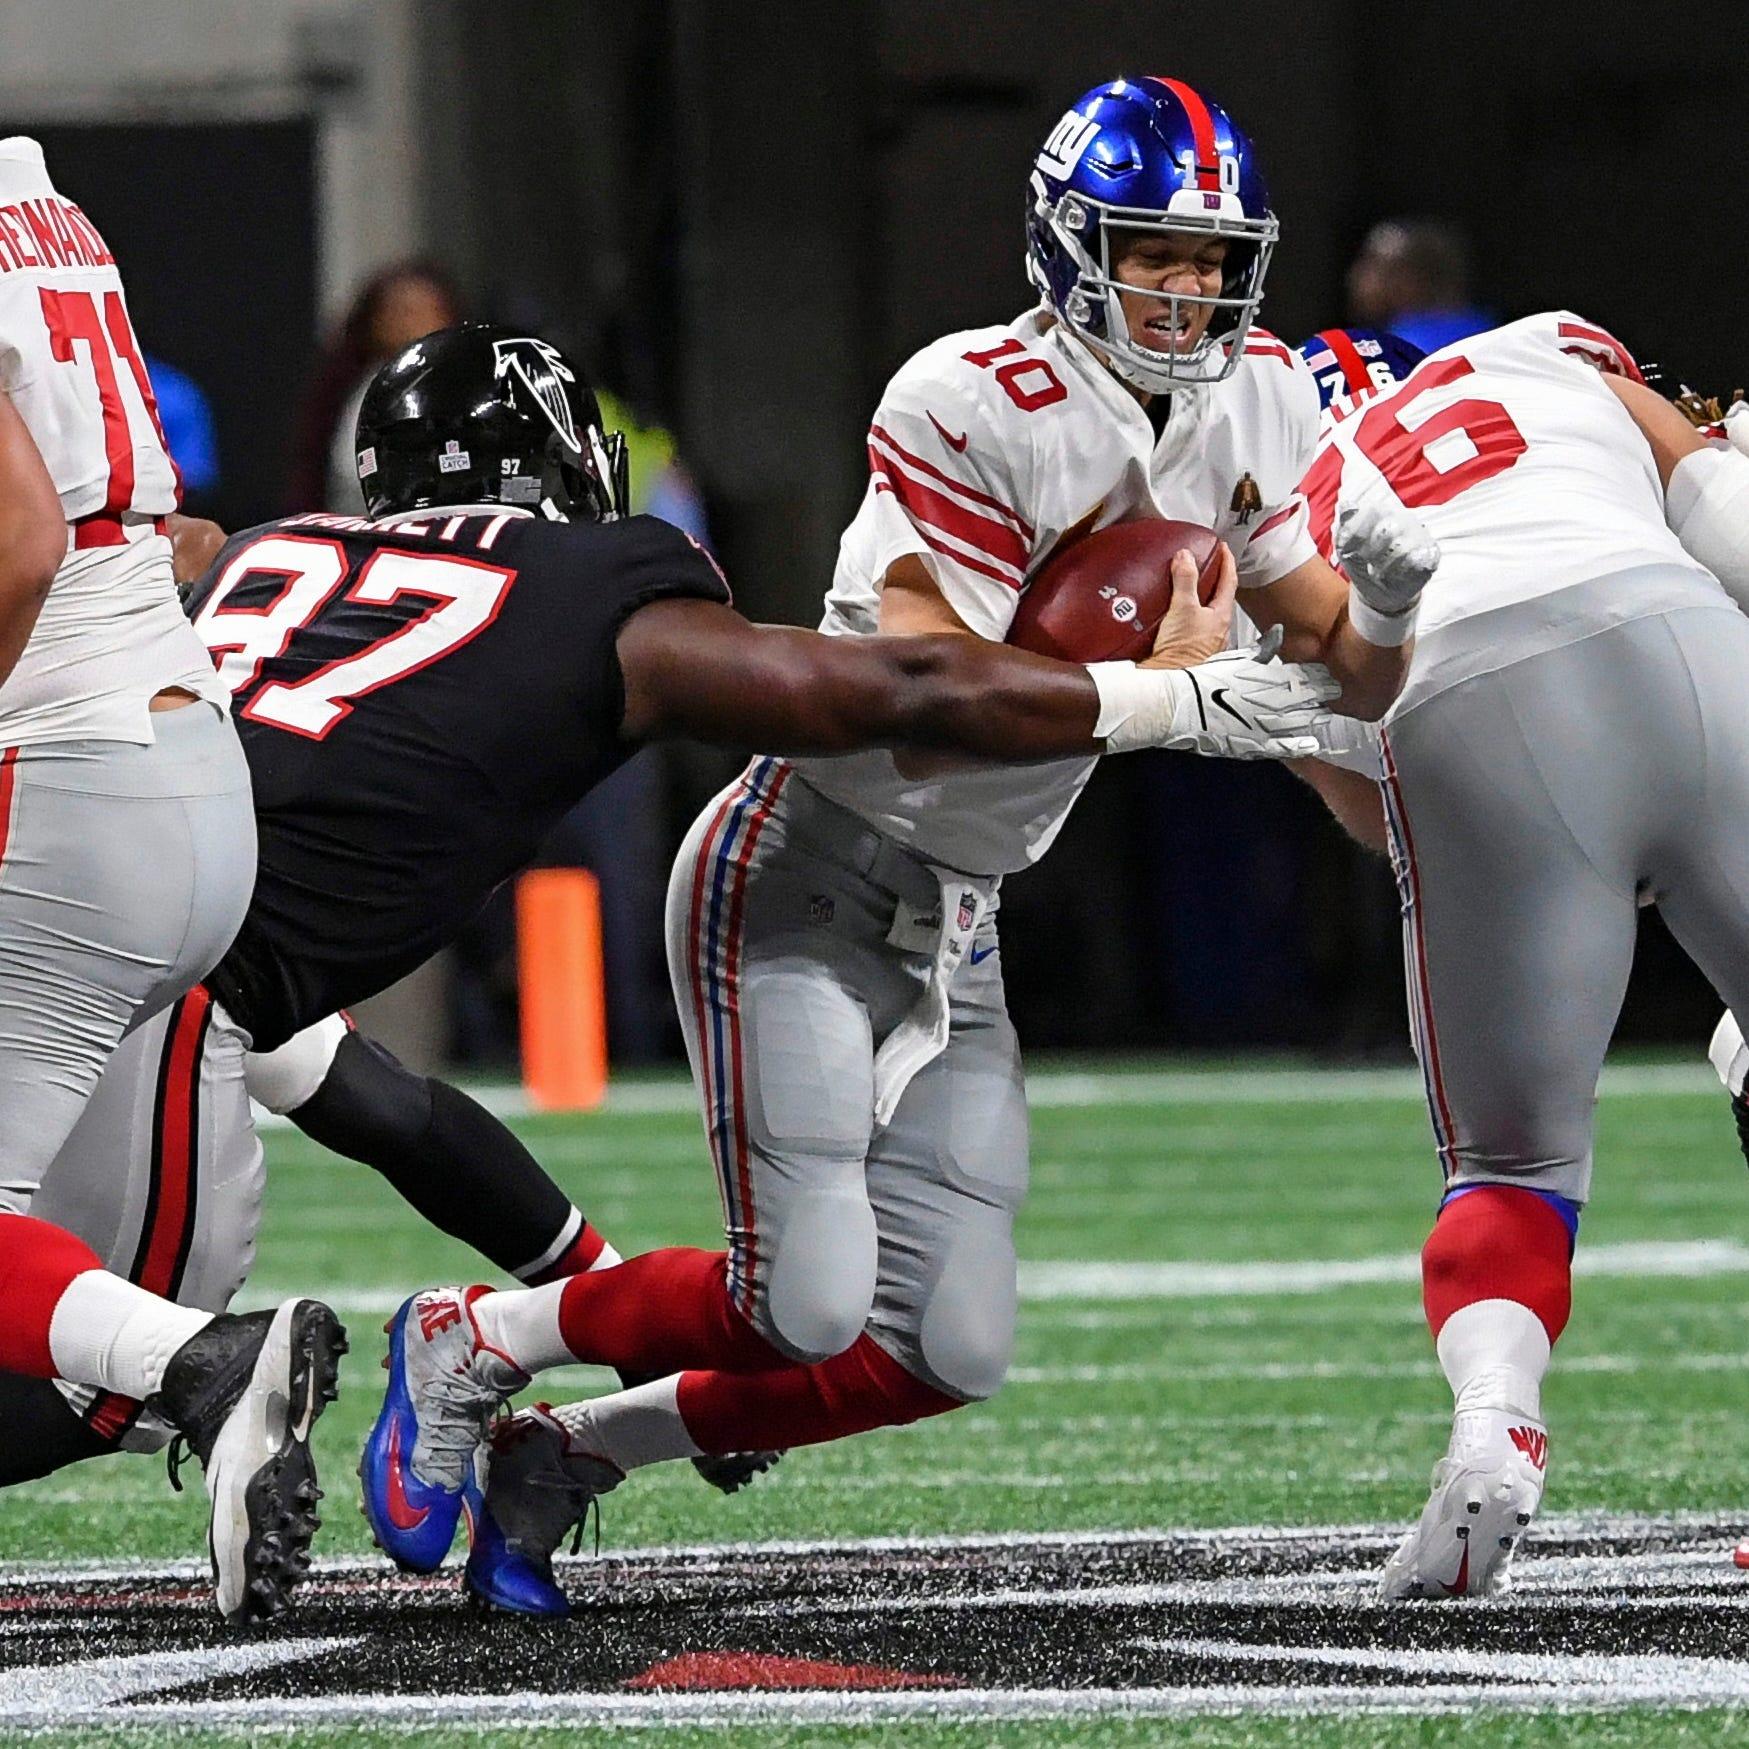 NY Giants vs. Atlanta Falcons: Too little, too late again as Big Blue comes up short